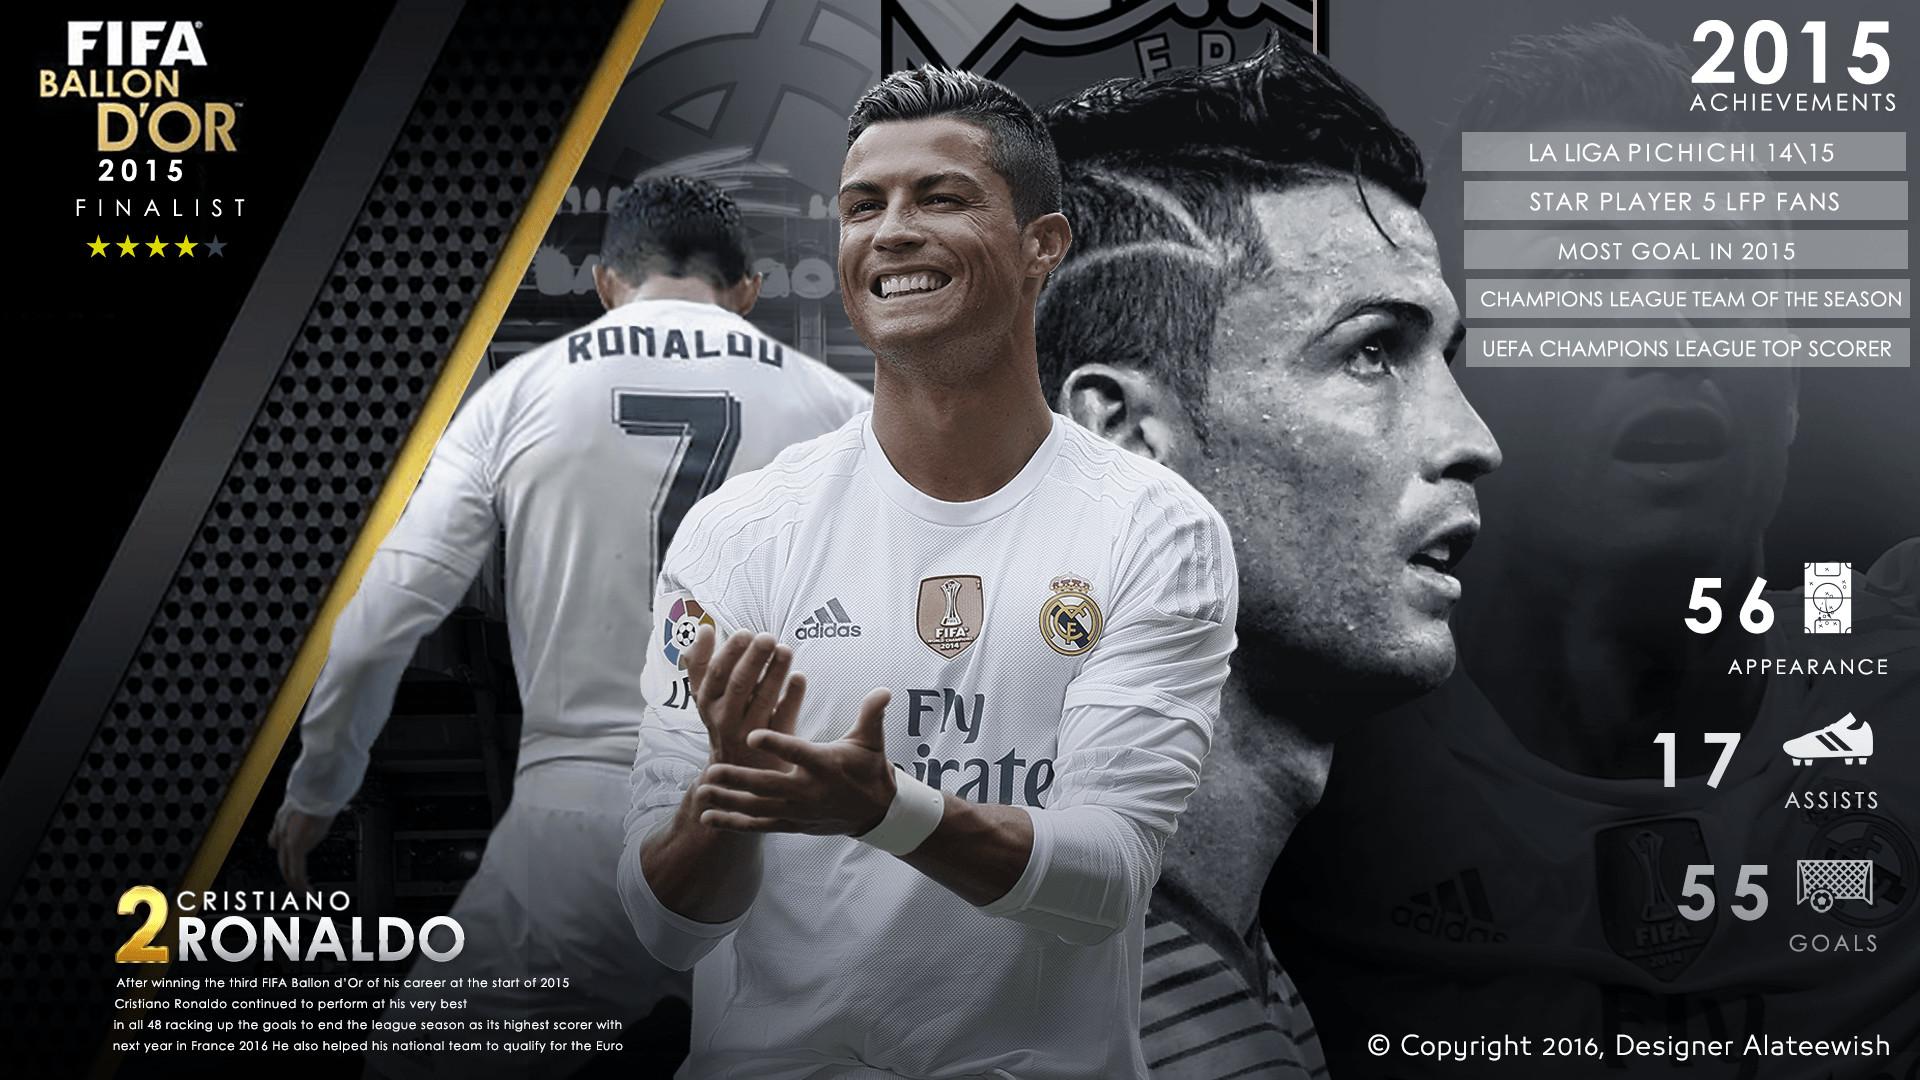 Best Awesome <b>Cristiano Ronaldo</b> HD <b>Wallpapers